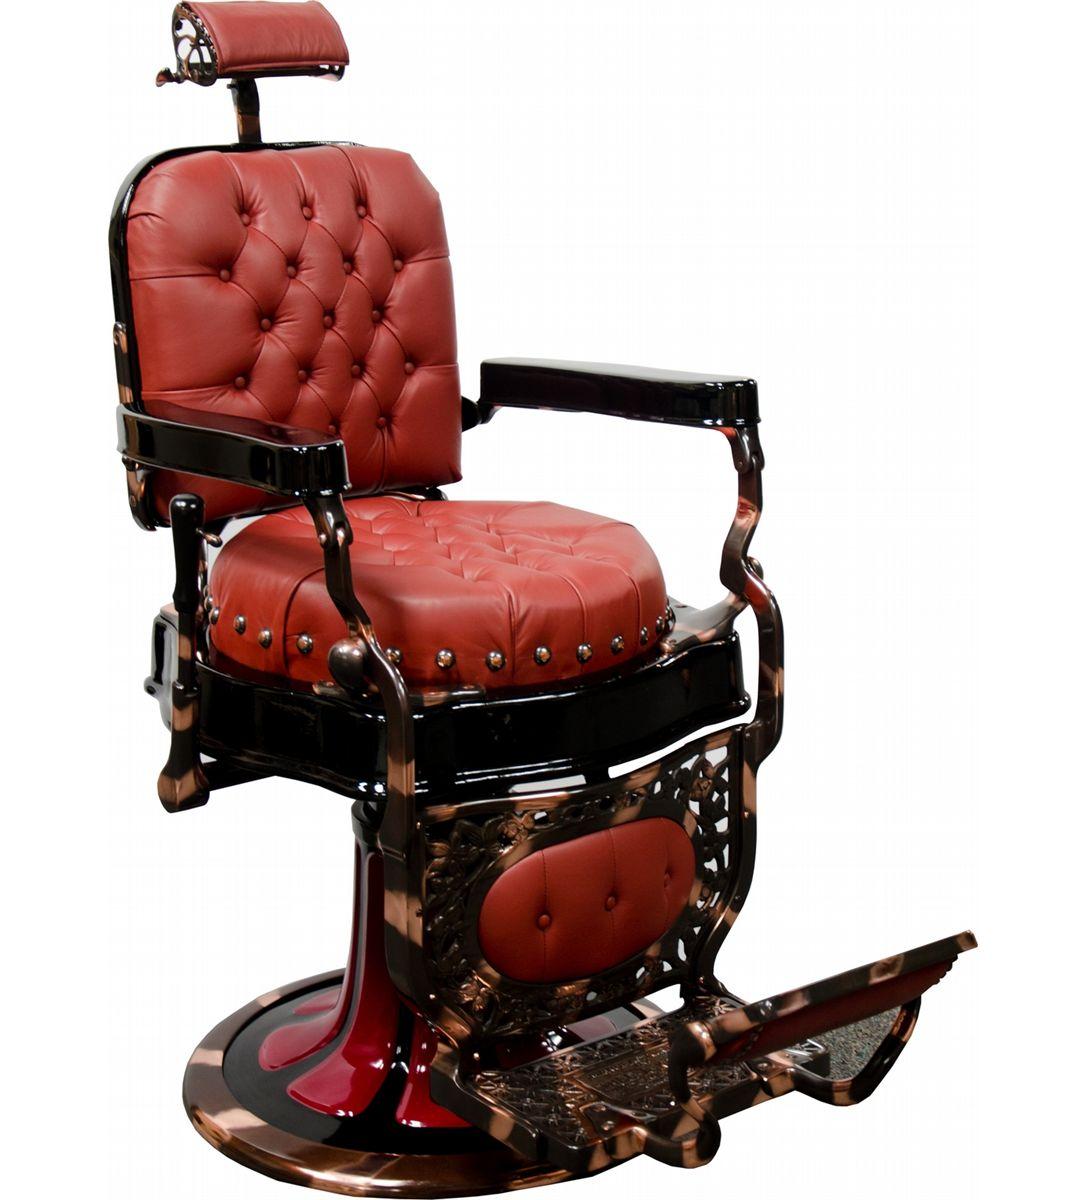 Shop For Chairs: Barber Girl Photos: มิถุนายน 2013